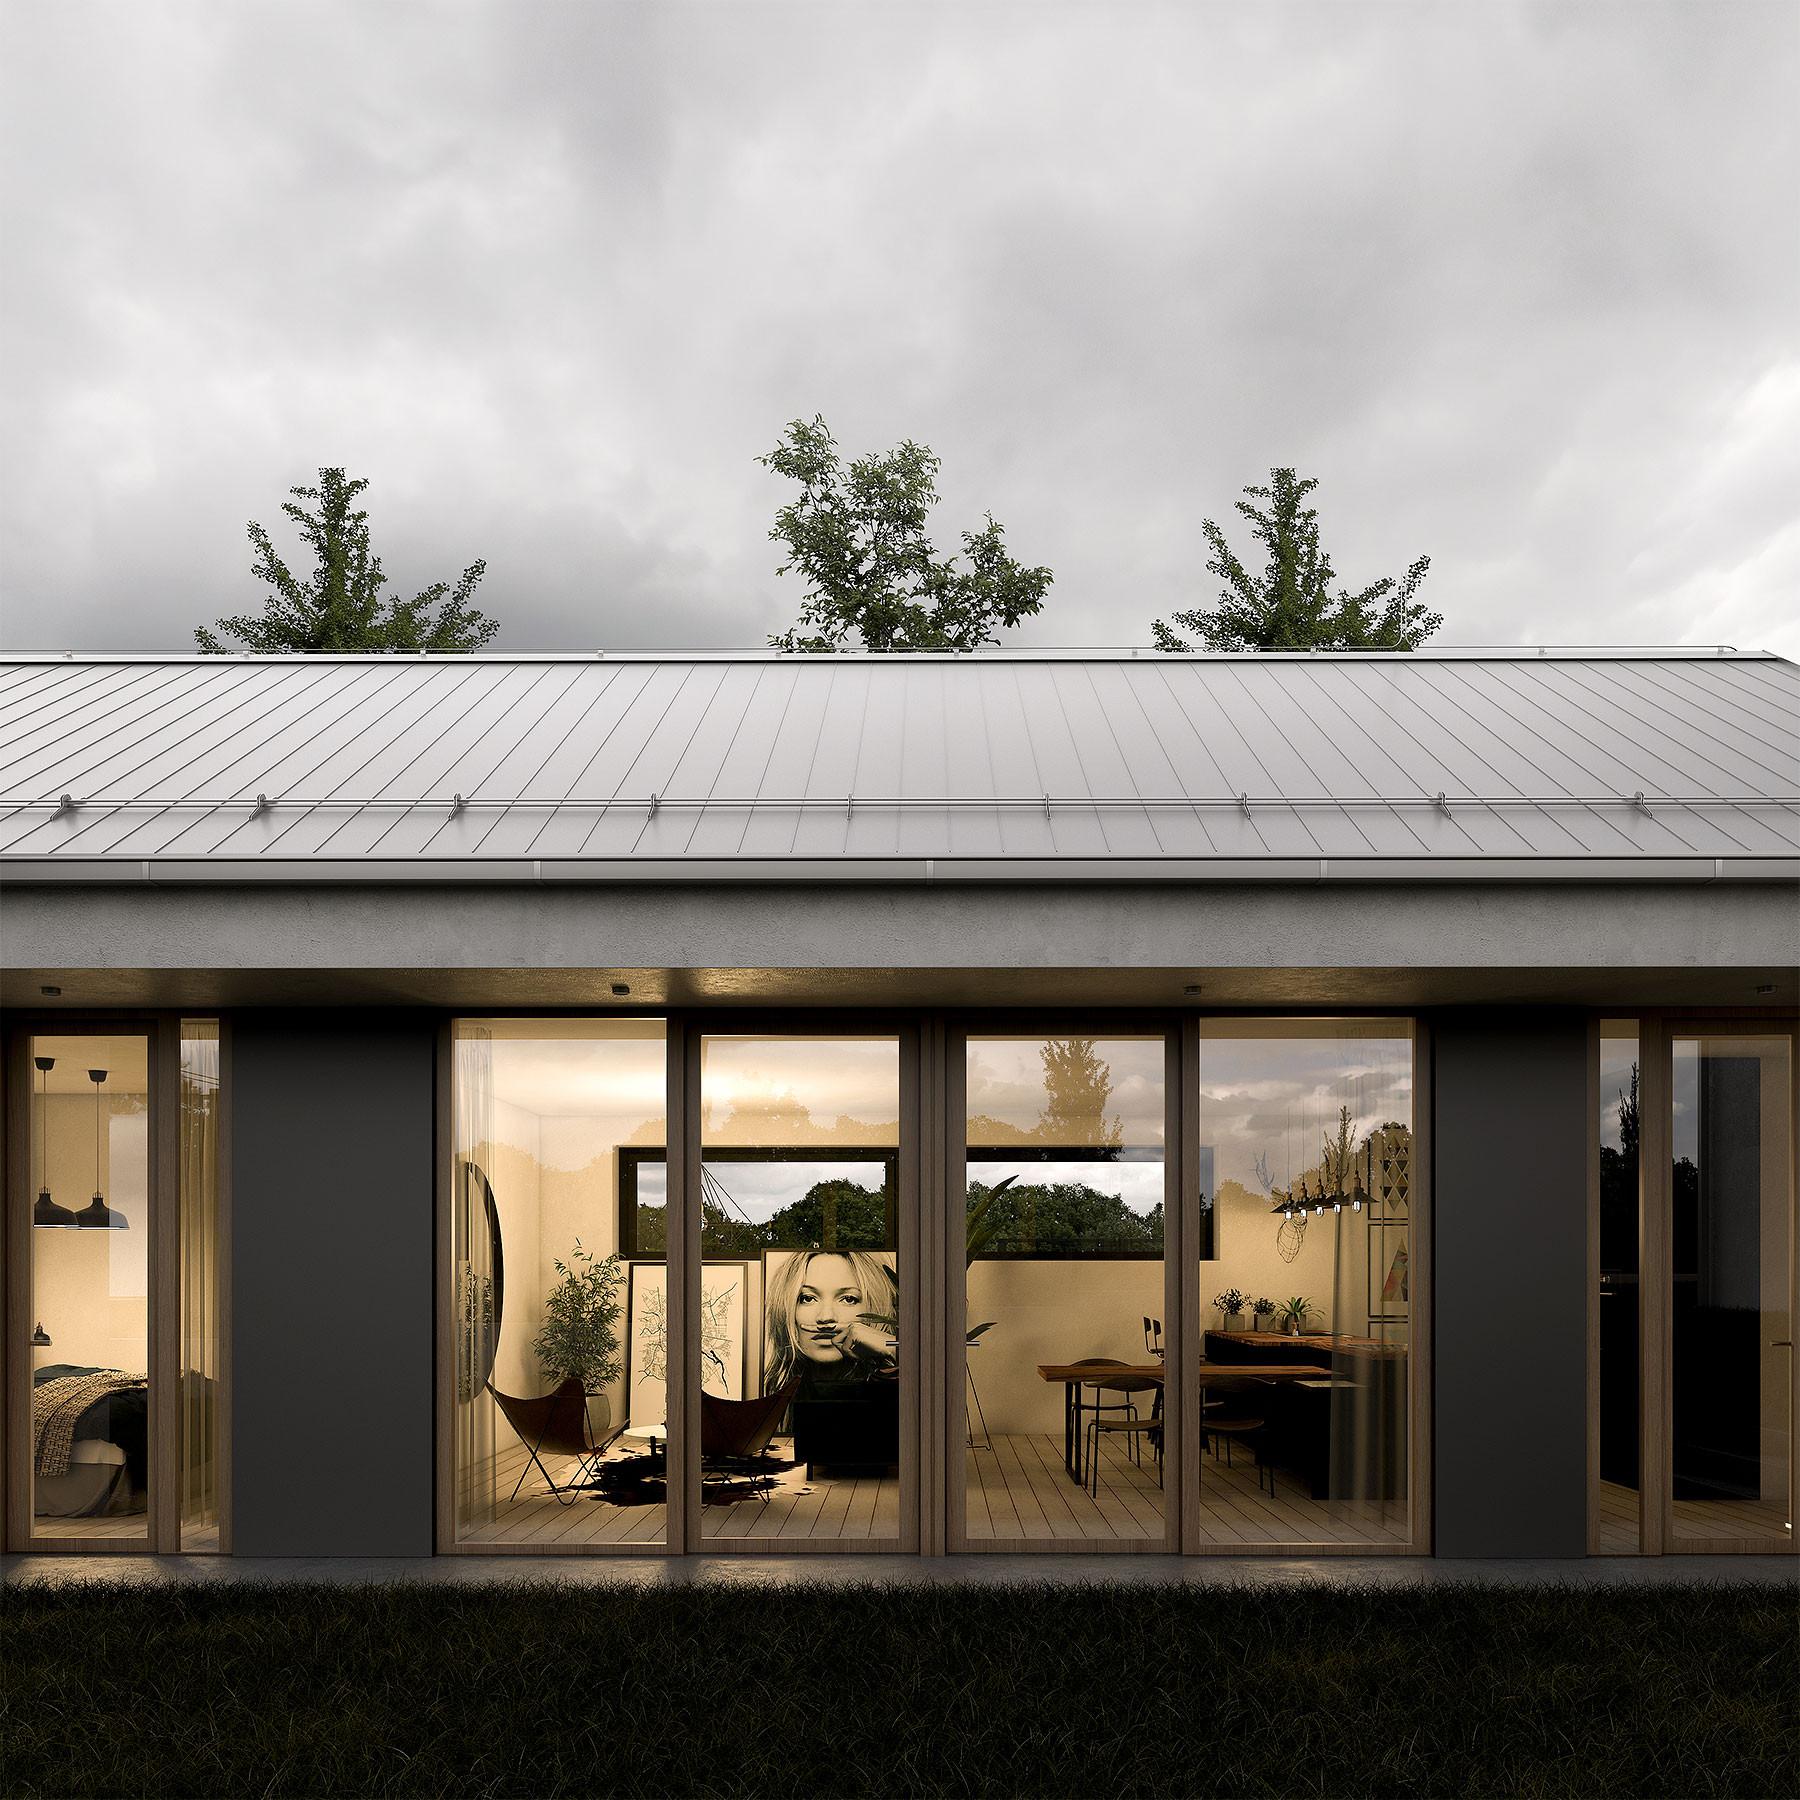 viceurovnova-moderni-vila-se-sikmou-strechou-dream-homes-plavec-detail